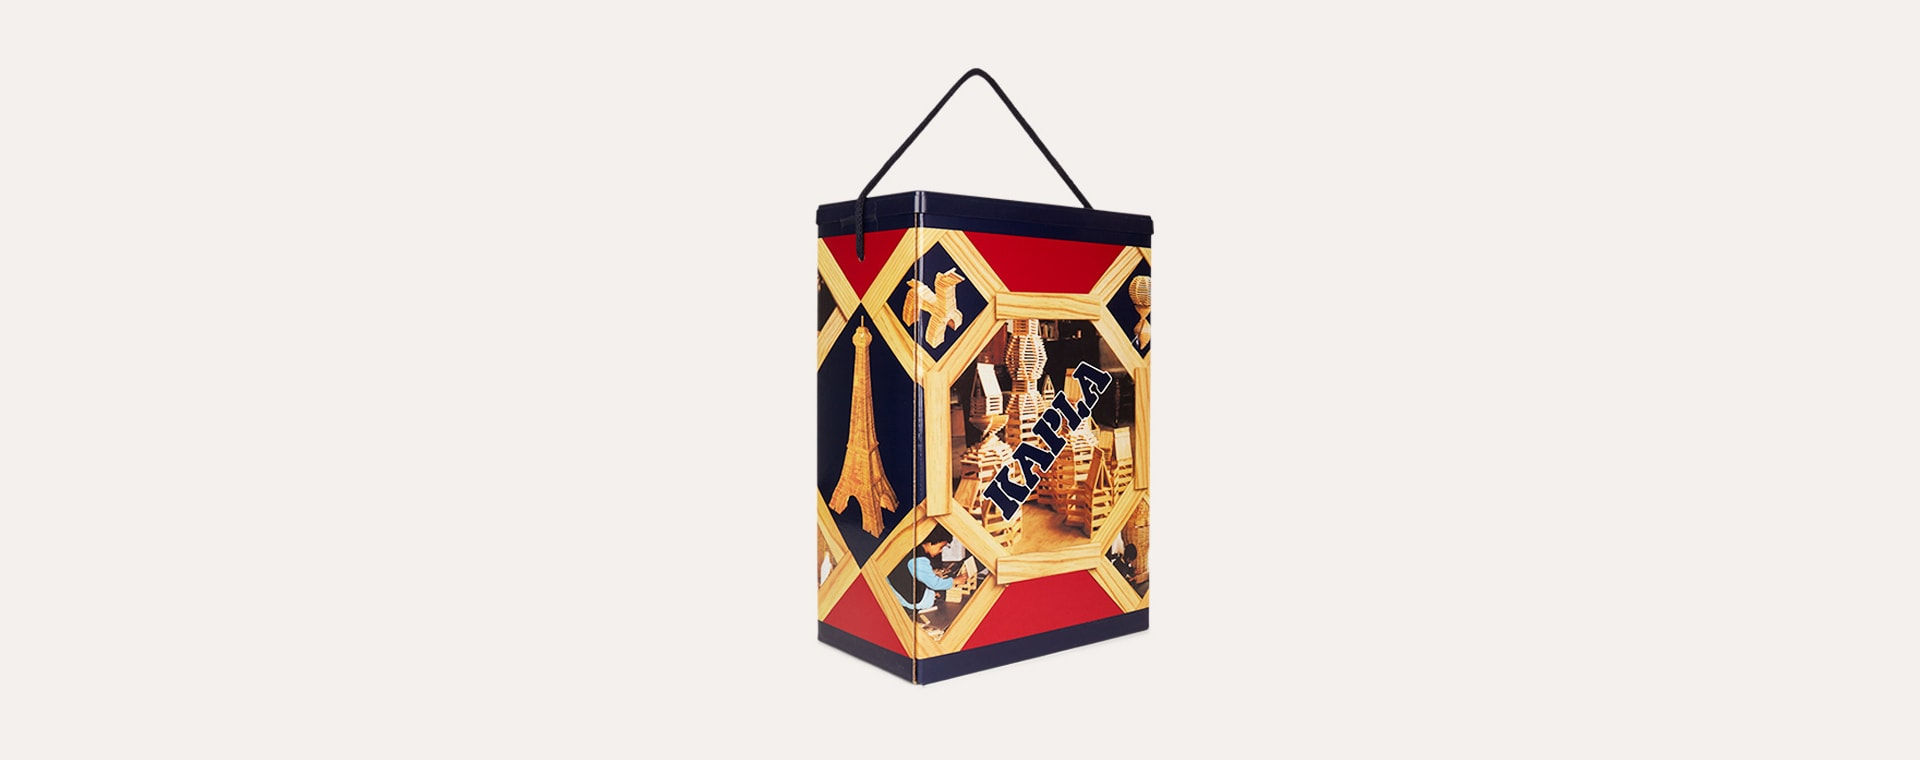 Neutral kapla Original Building Set - 200 Pieces Box